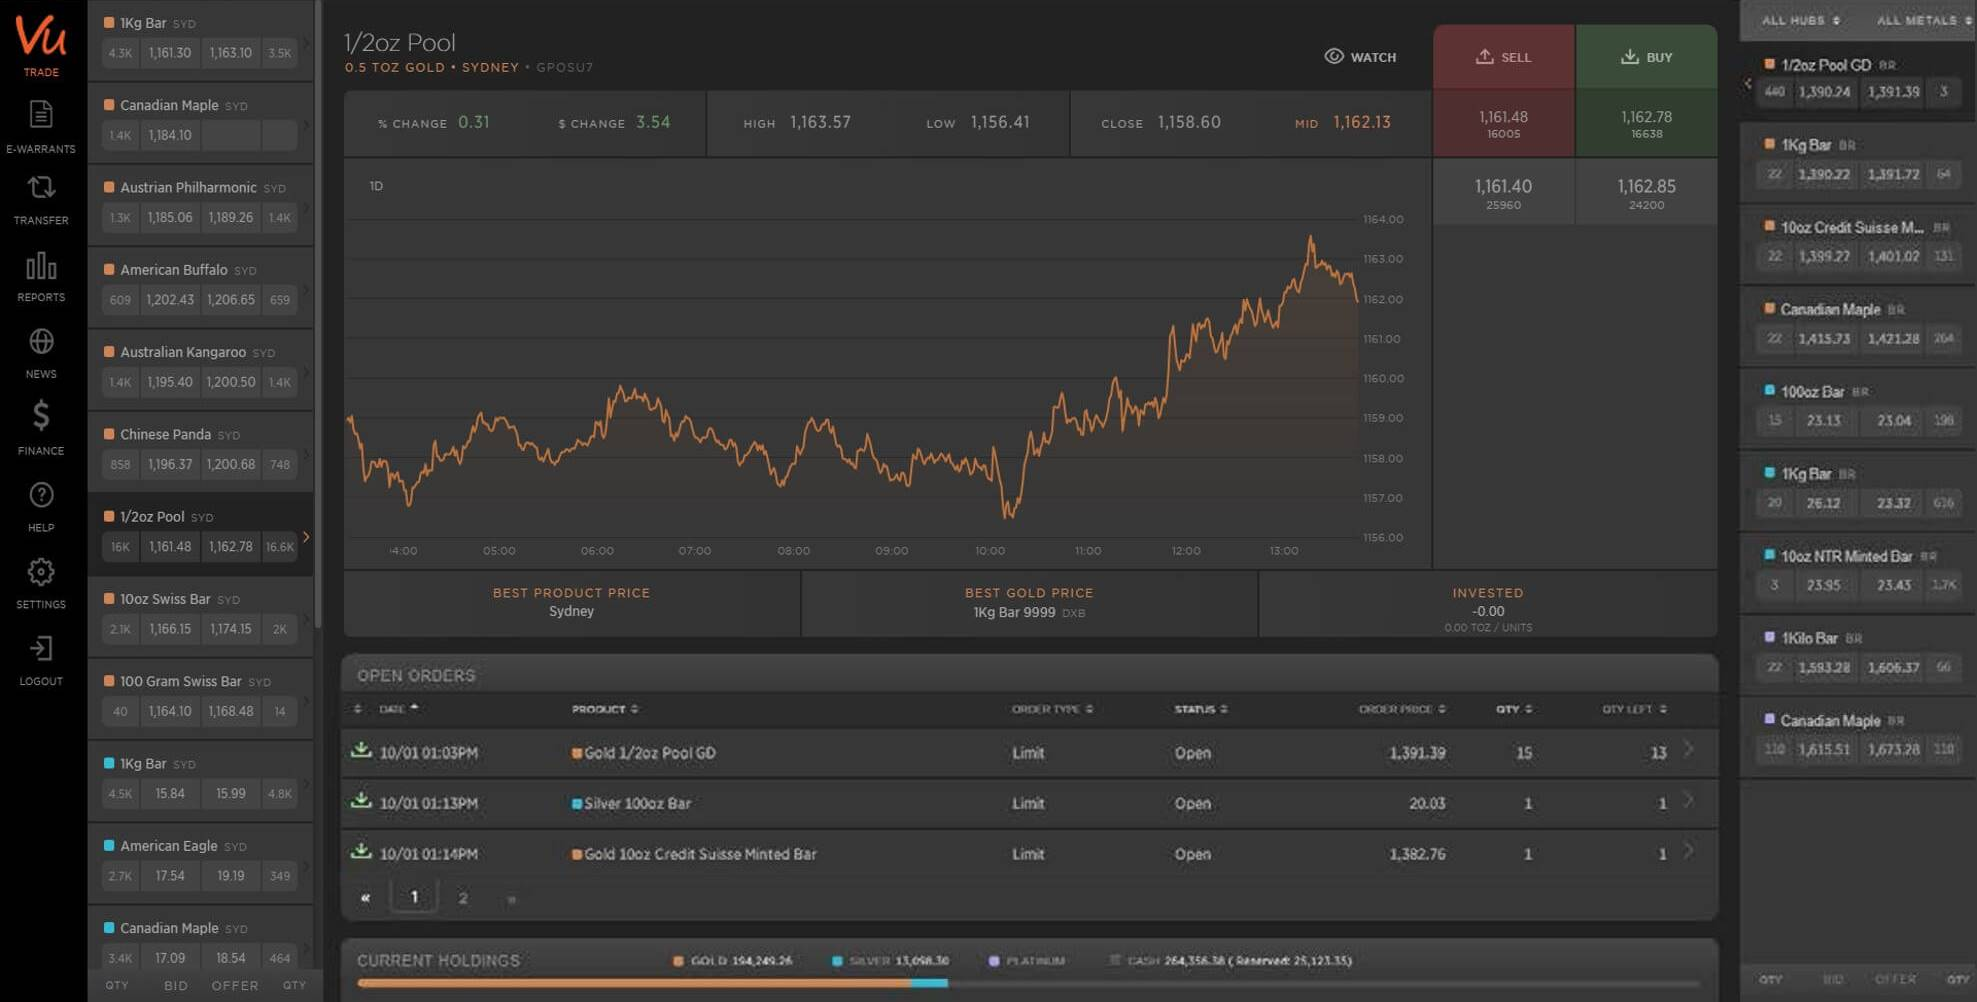 MetalDesk Gold Bullion and Precious Metals Trading Platform